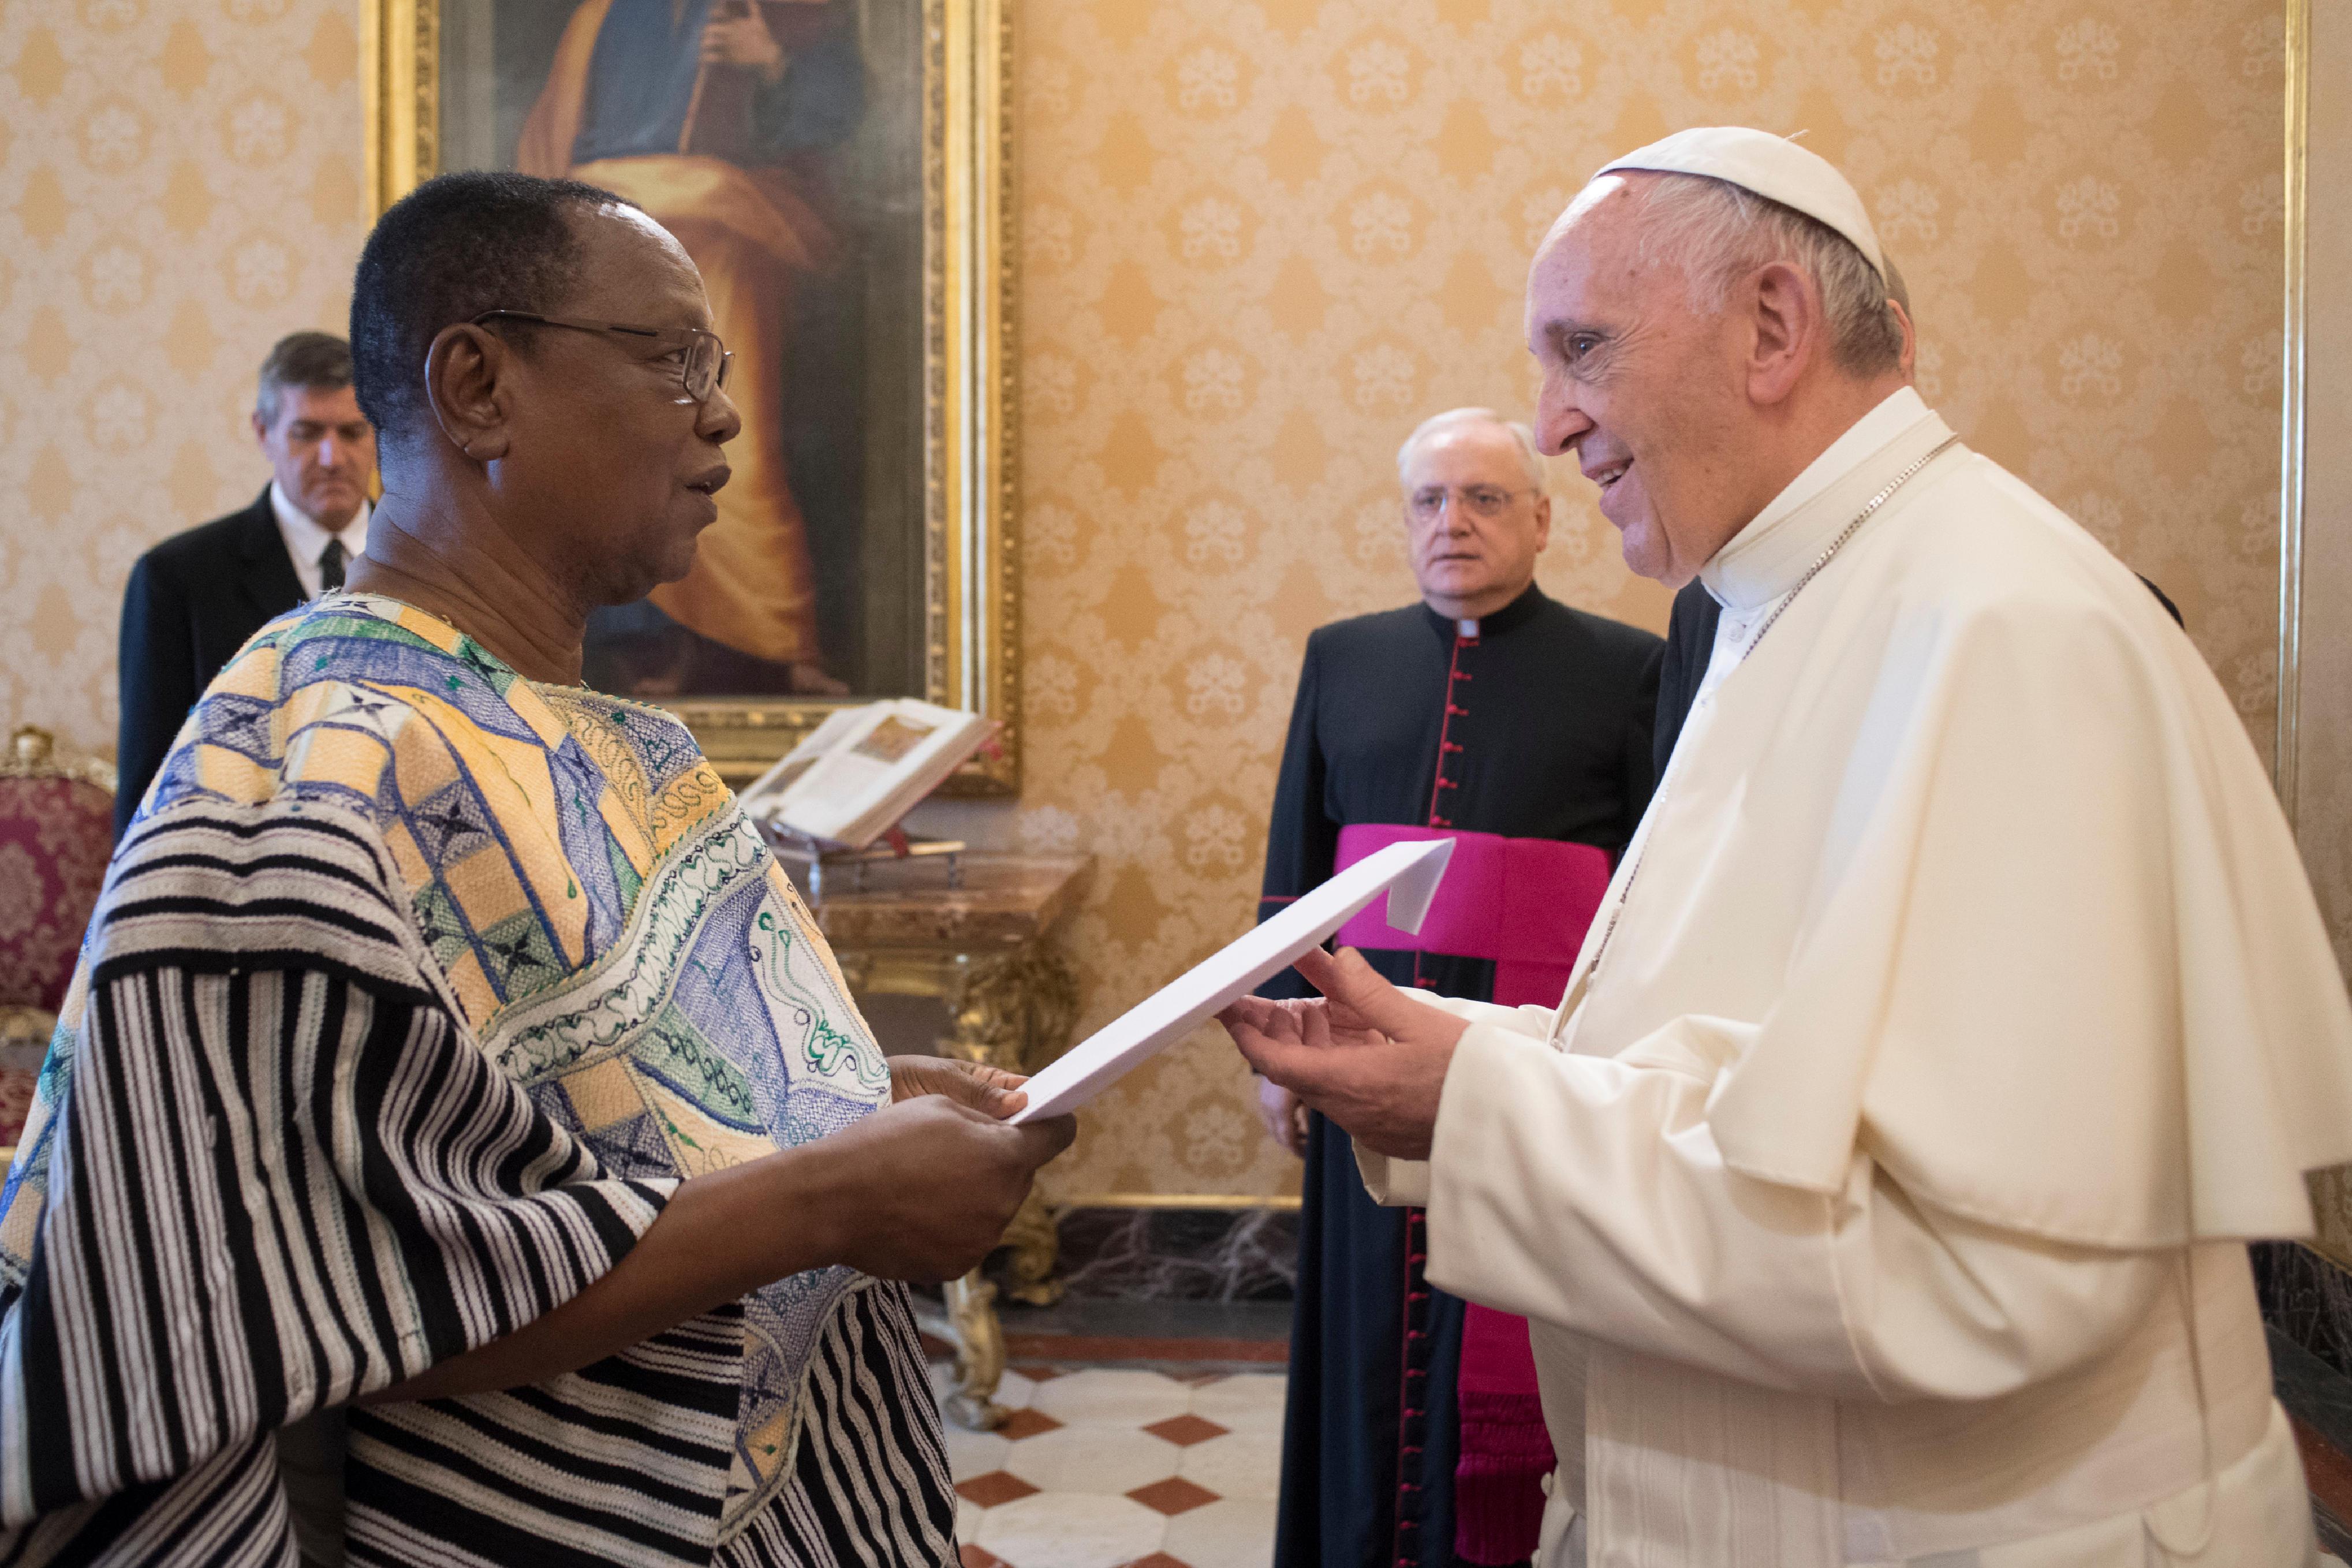 Ambassadeur du Ghana ©, L'Osservatore Romano